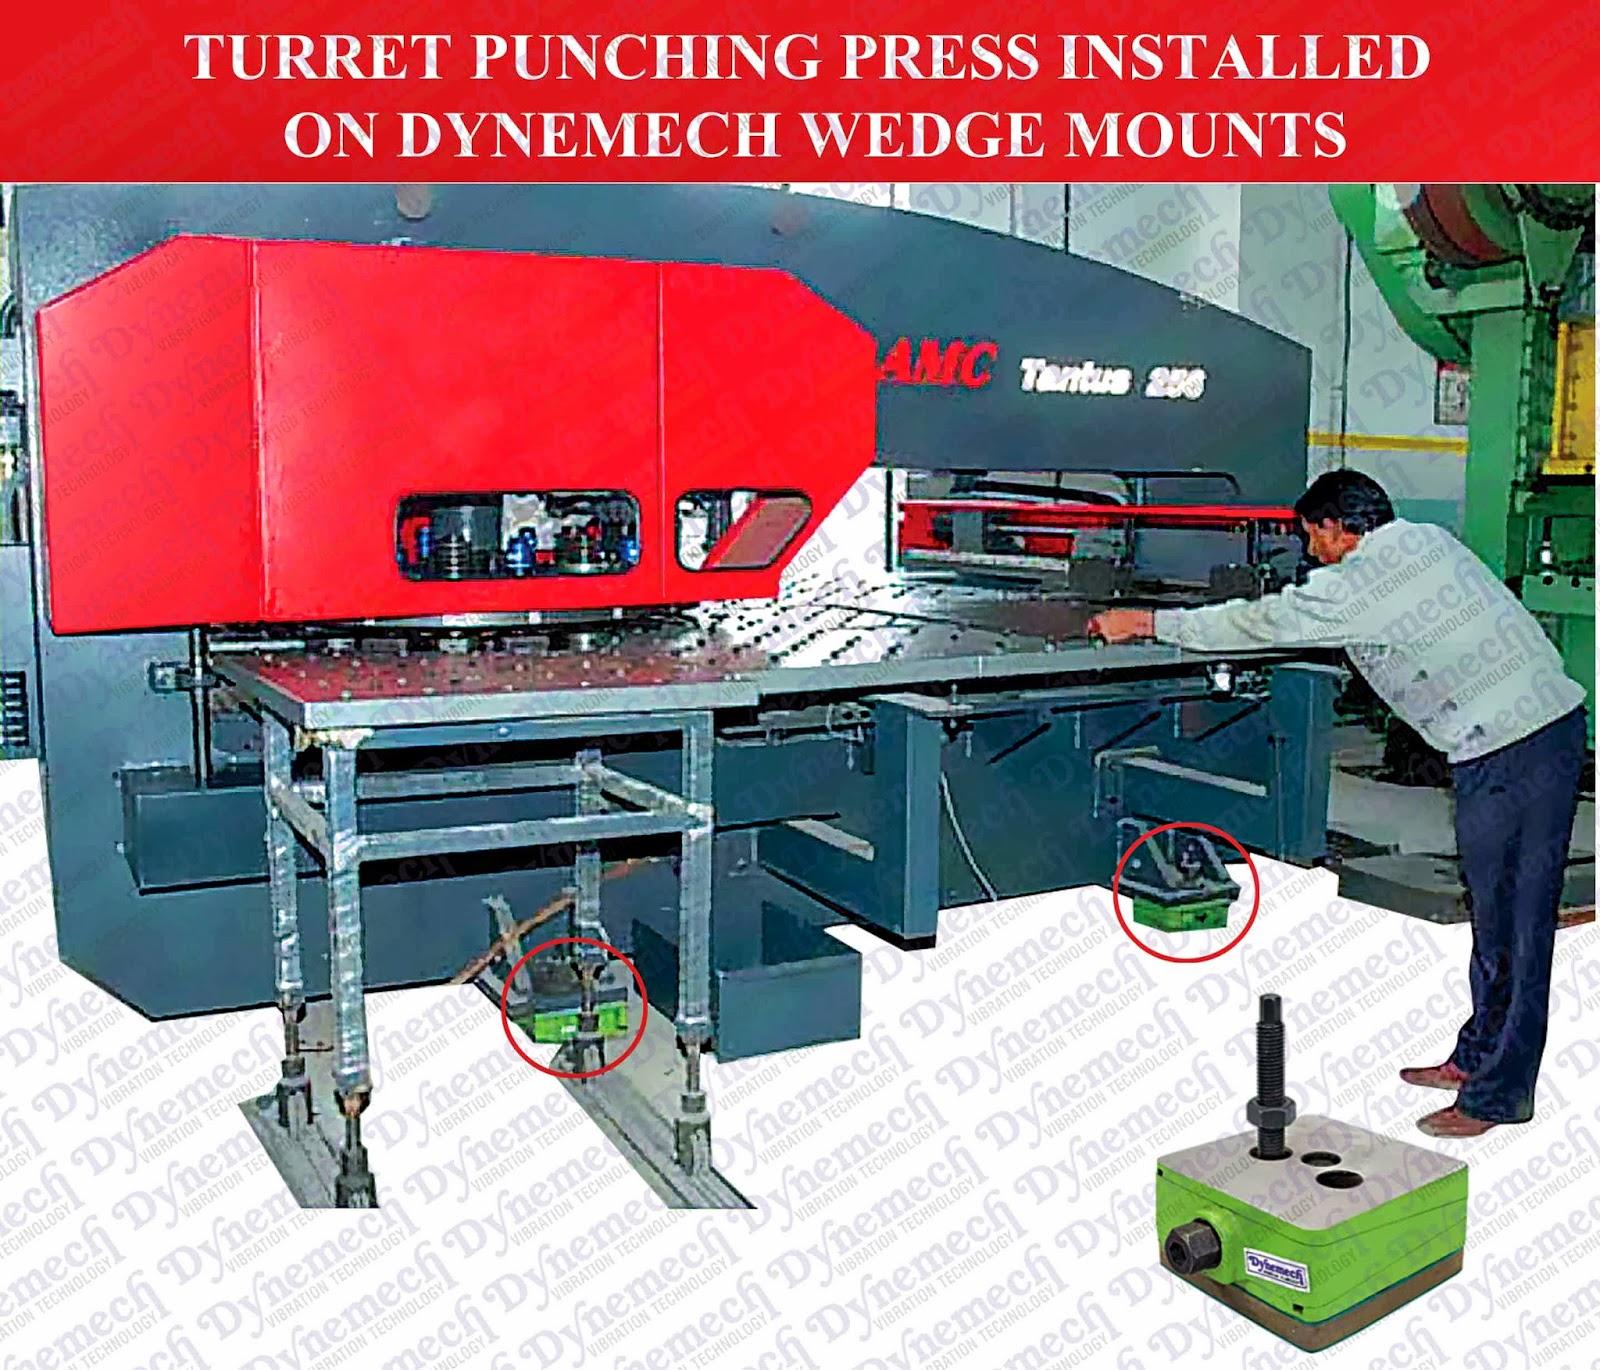 Dynemech Systems Vibration Control No Vibration